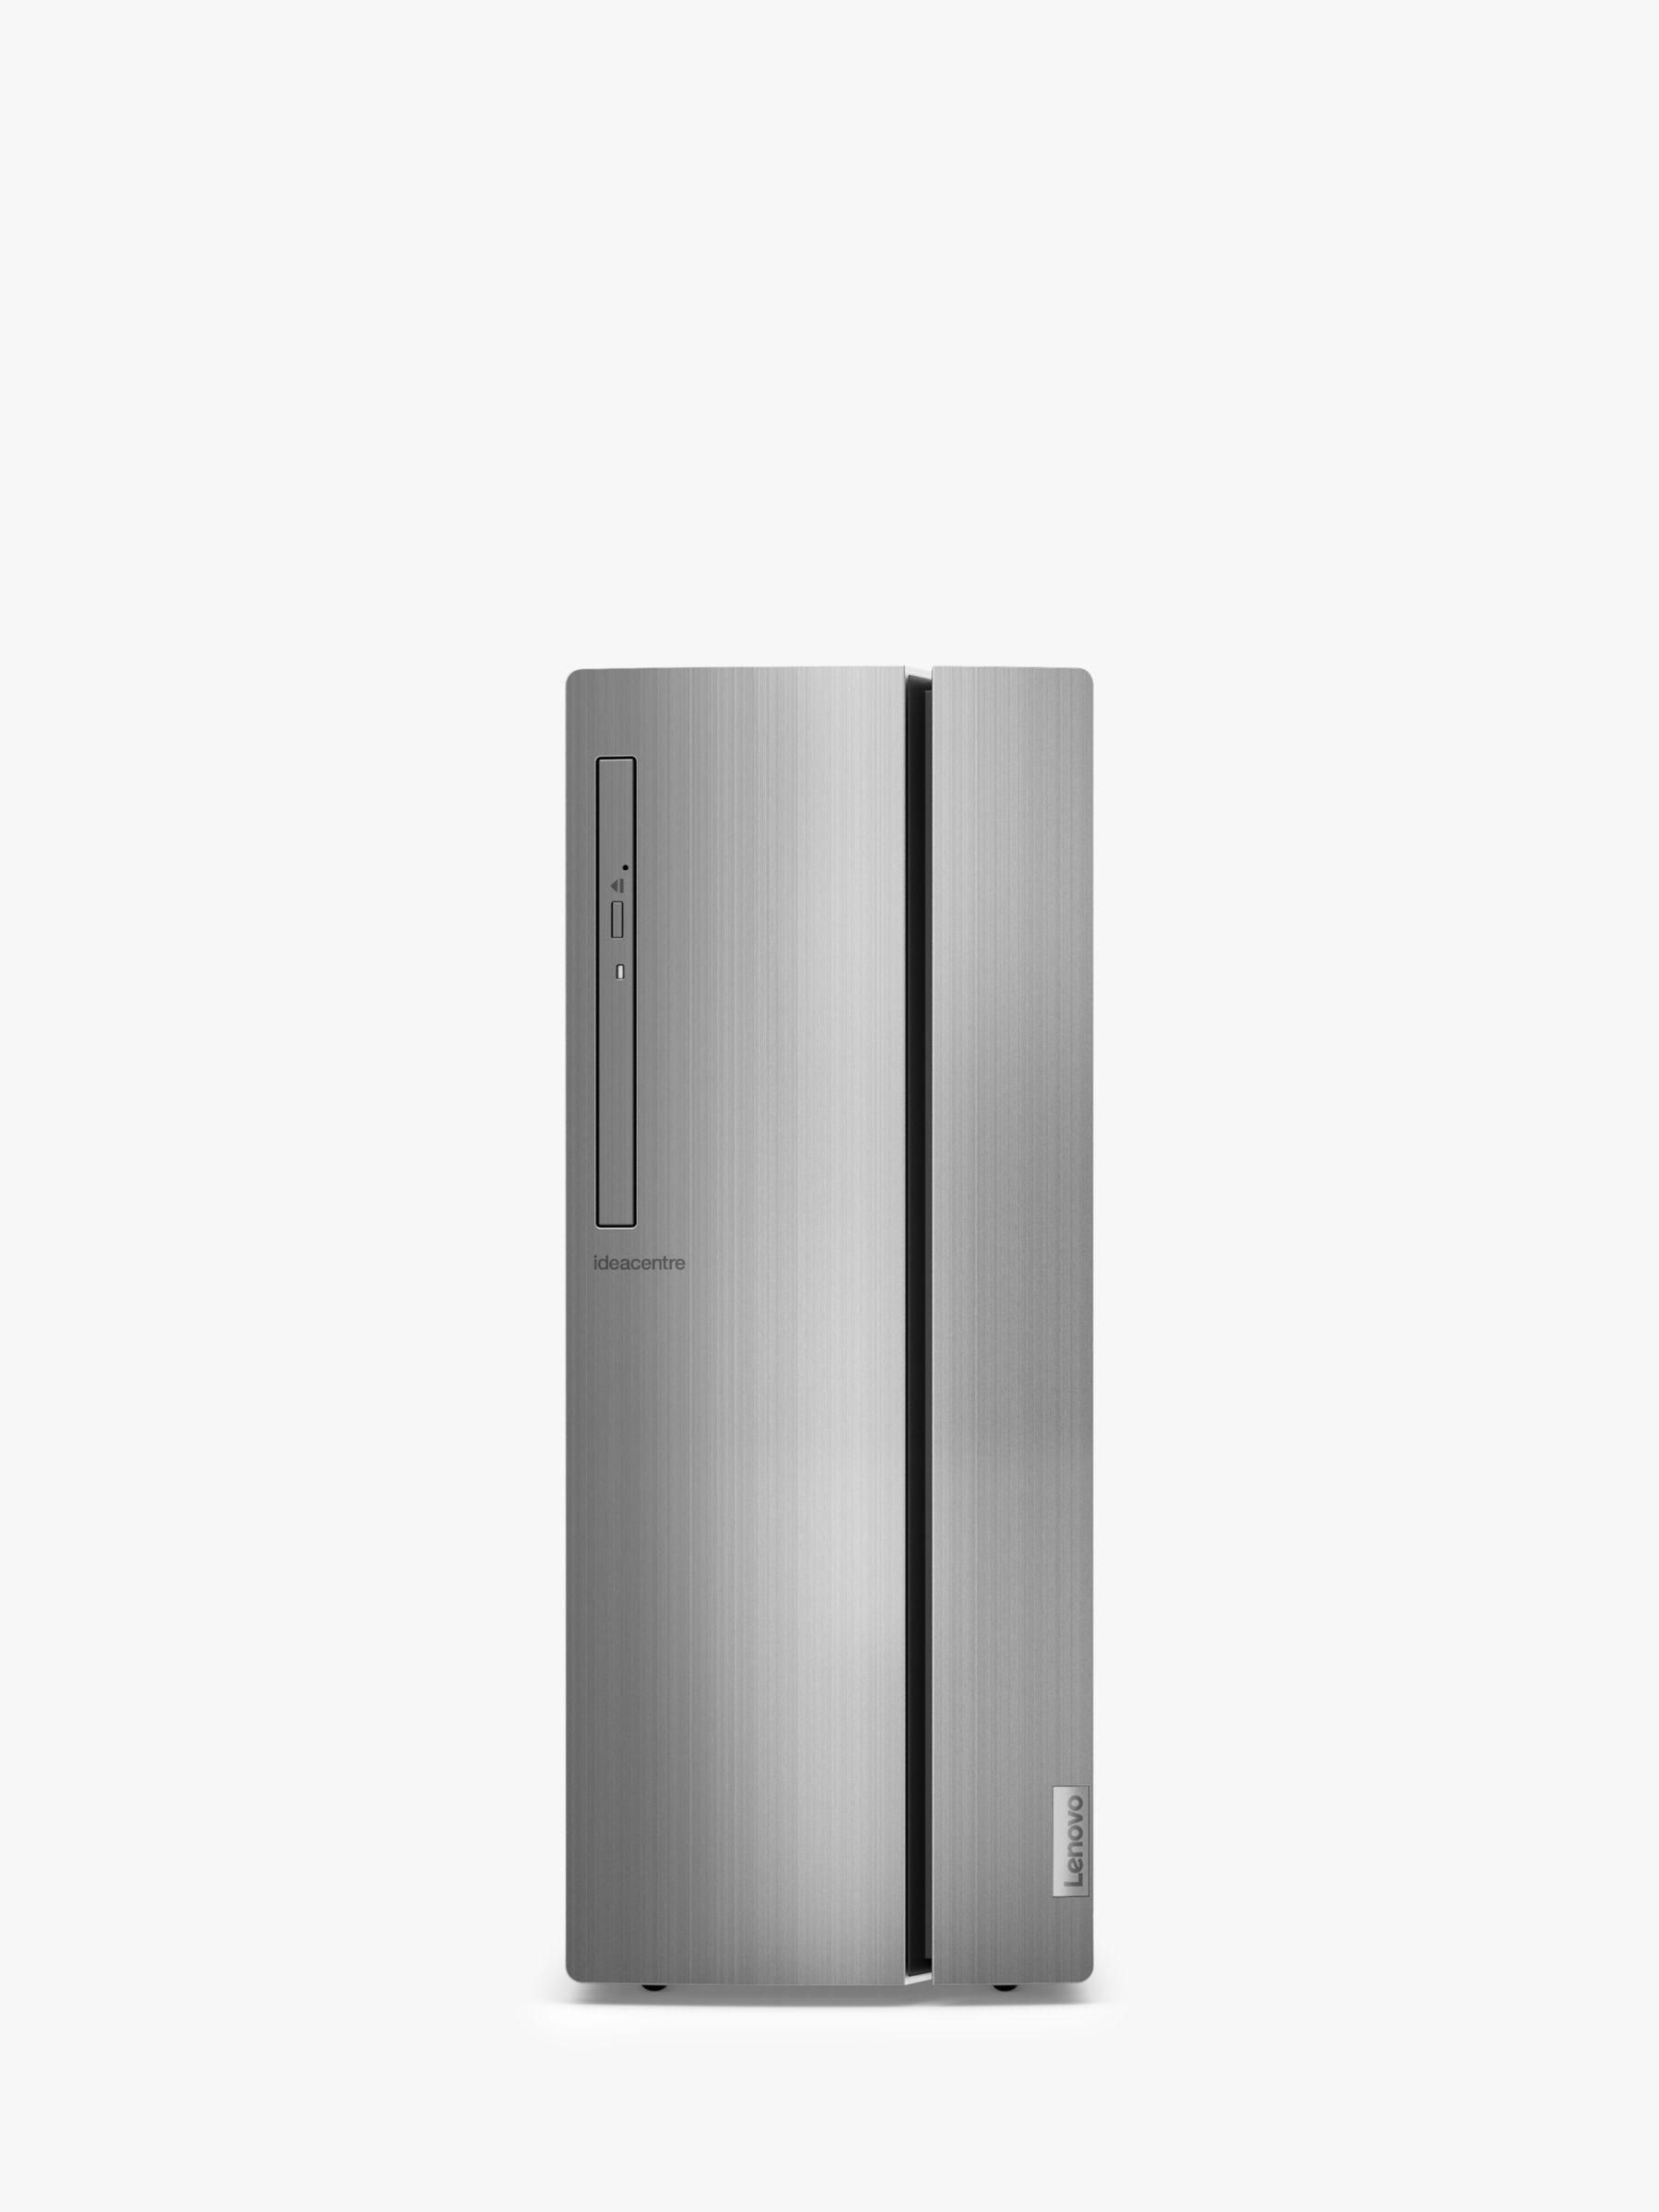 Lenovo Lenovo IdeaCentre 510 90HU00F8UK Desktop PC, Intel Core i7 Processor, 8GB RAM, 2TB HDD, Silver